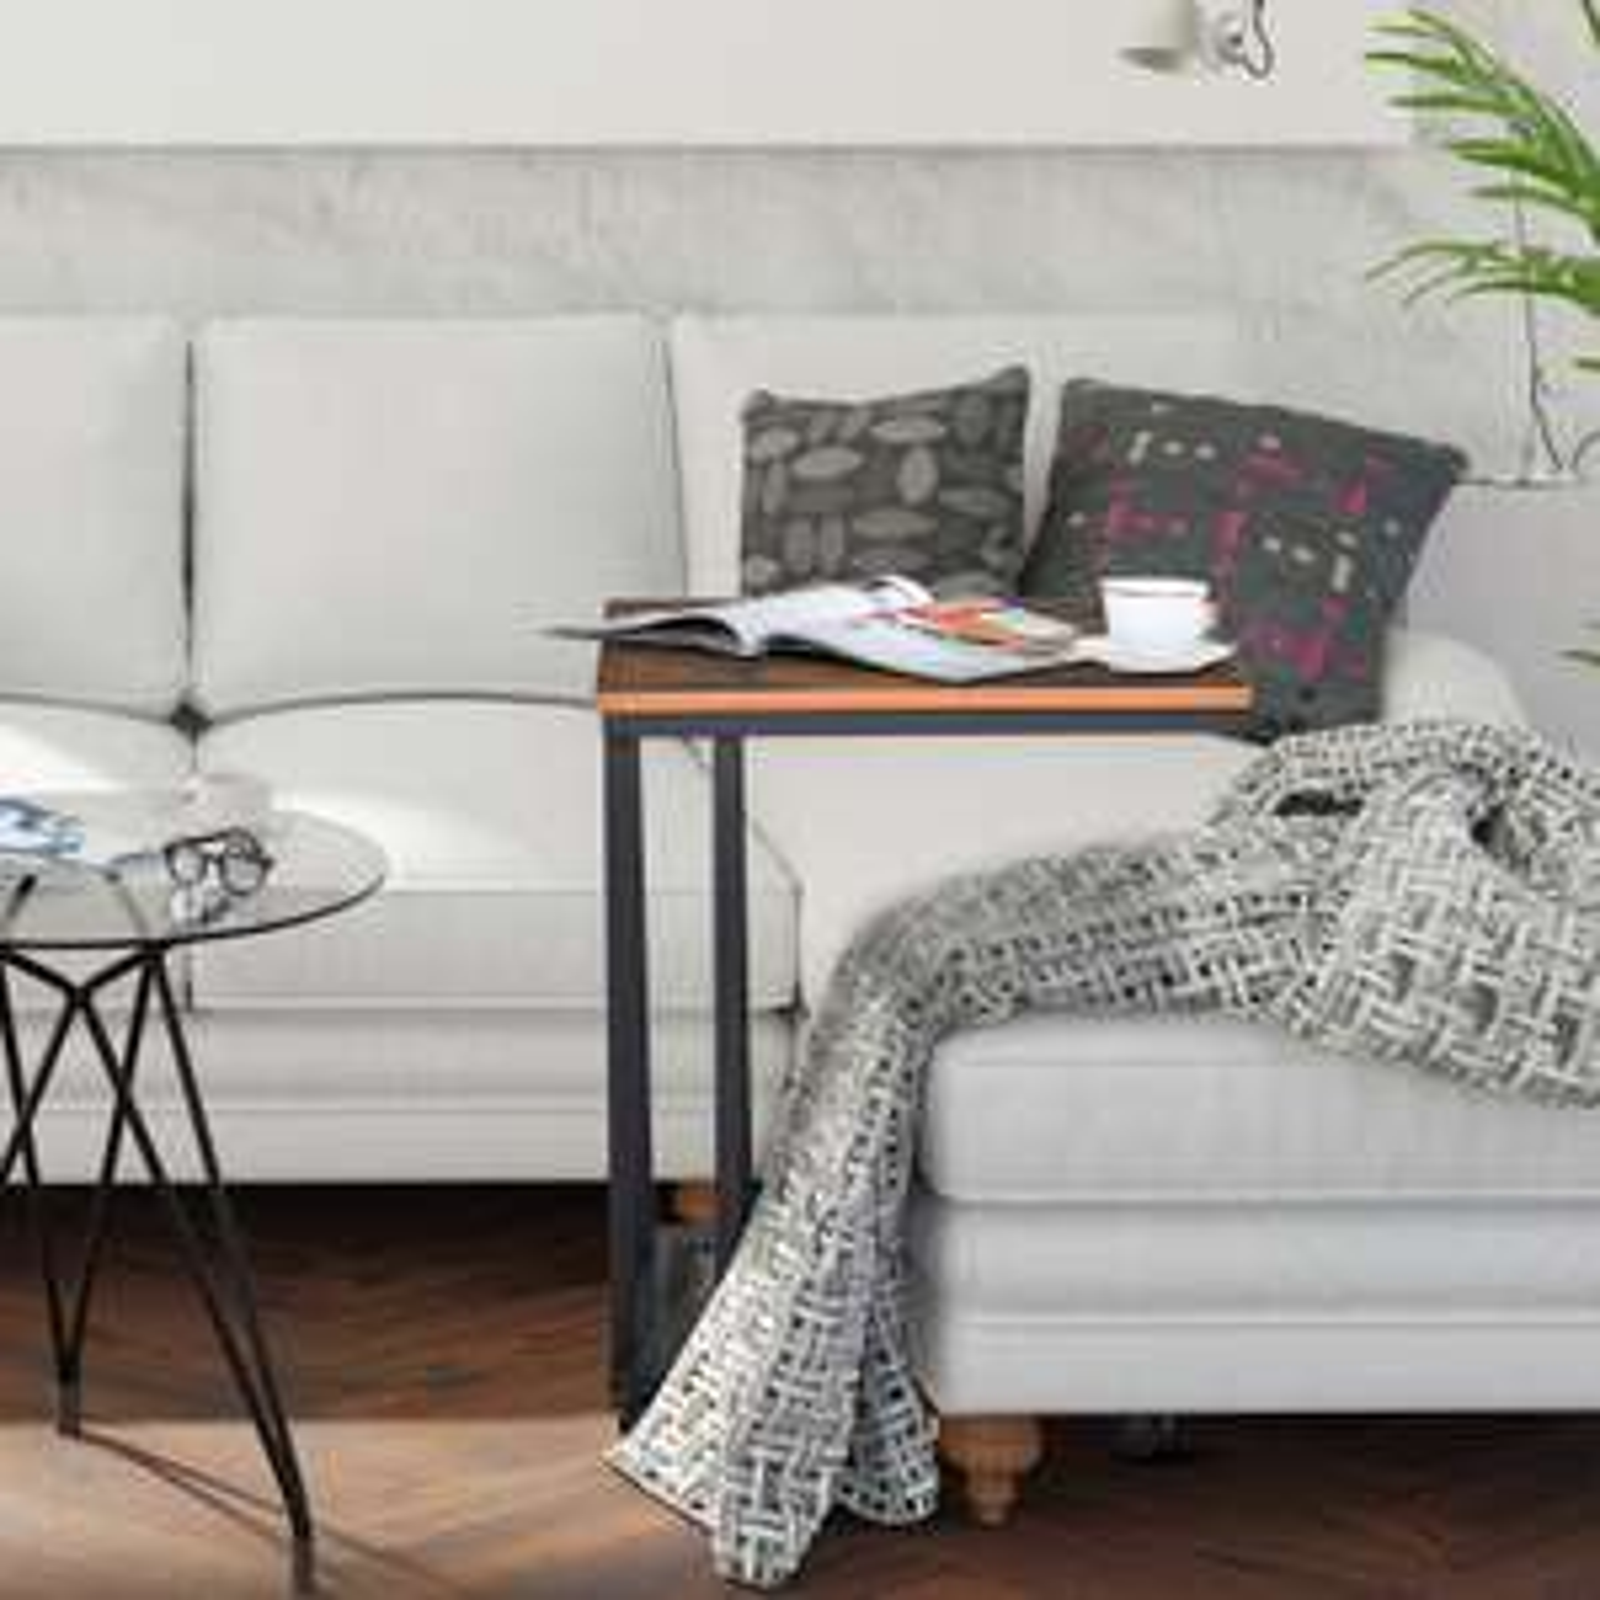 Sofa Side End Coffee Table on Castors - £23.99 Delivered (UK Mainland) Using Code @ eBay / 2011homcom